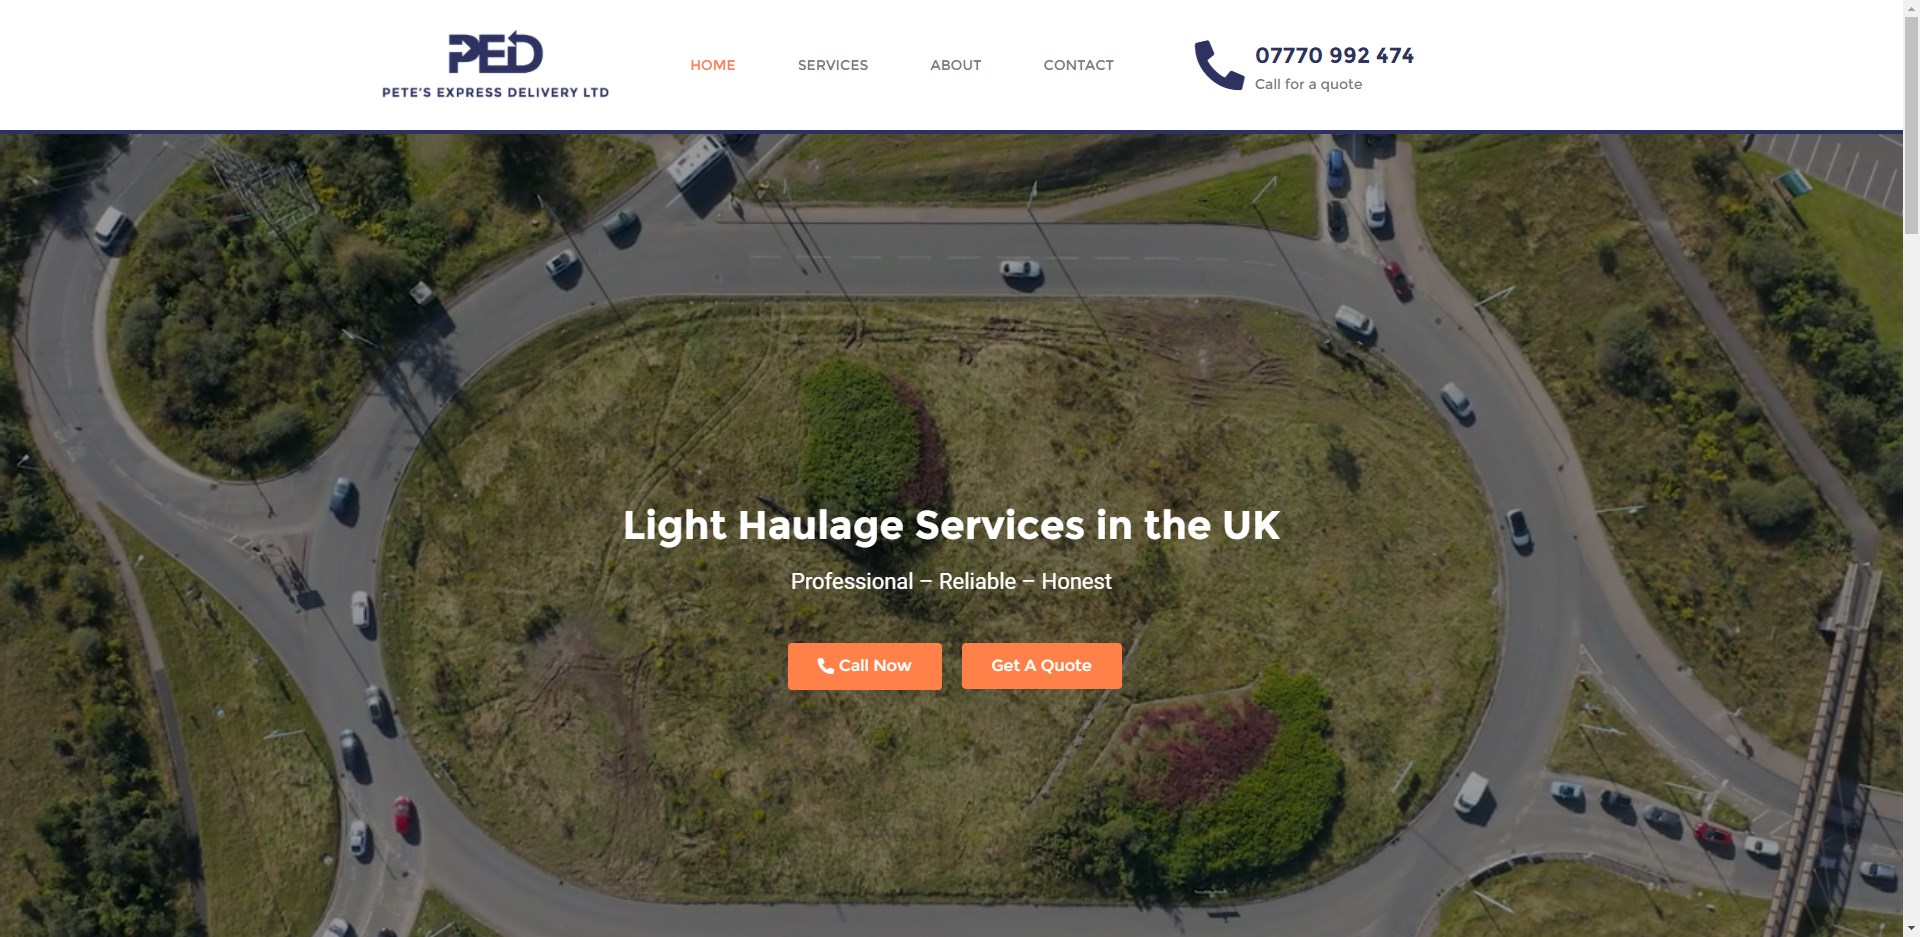 Pete's Express Delivery Website Design